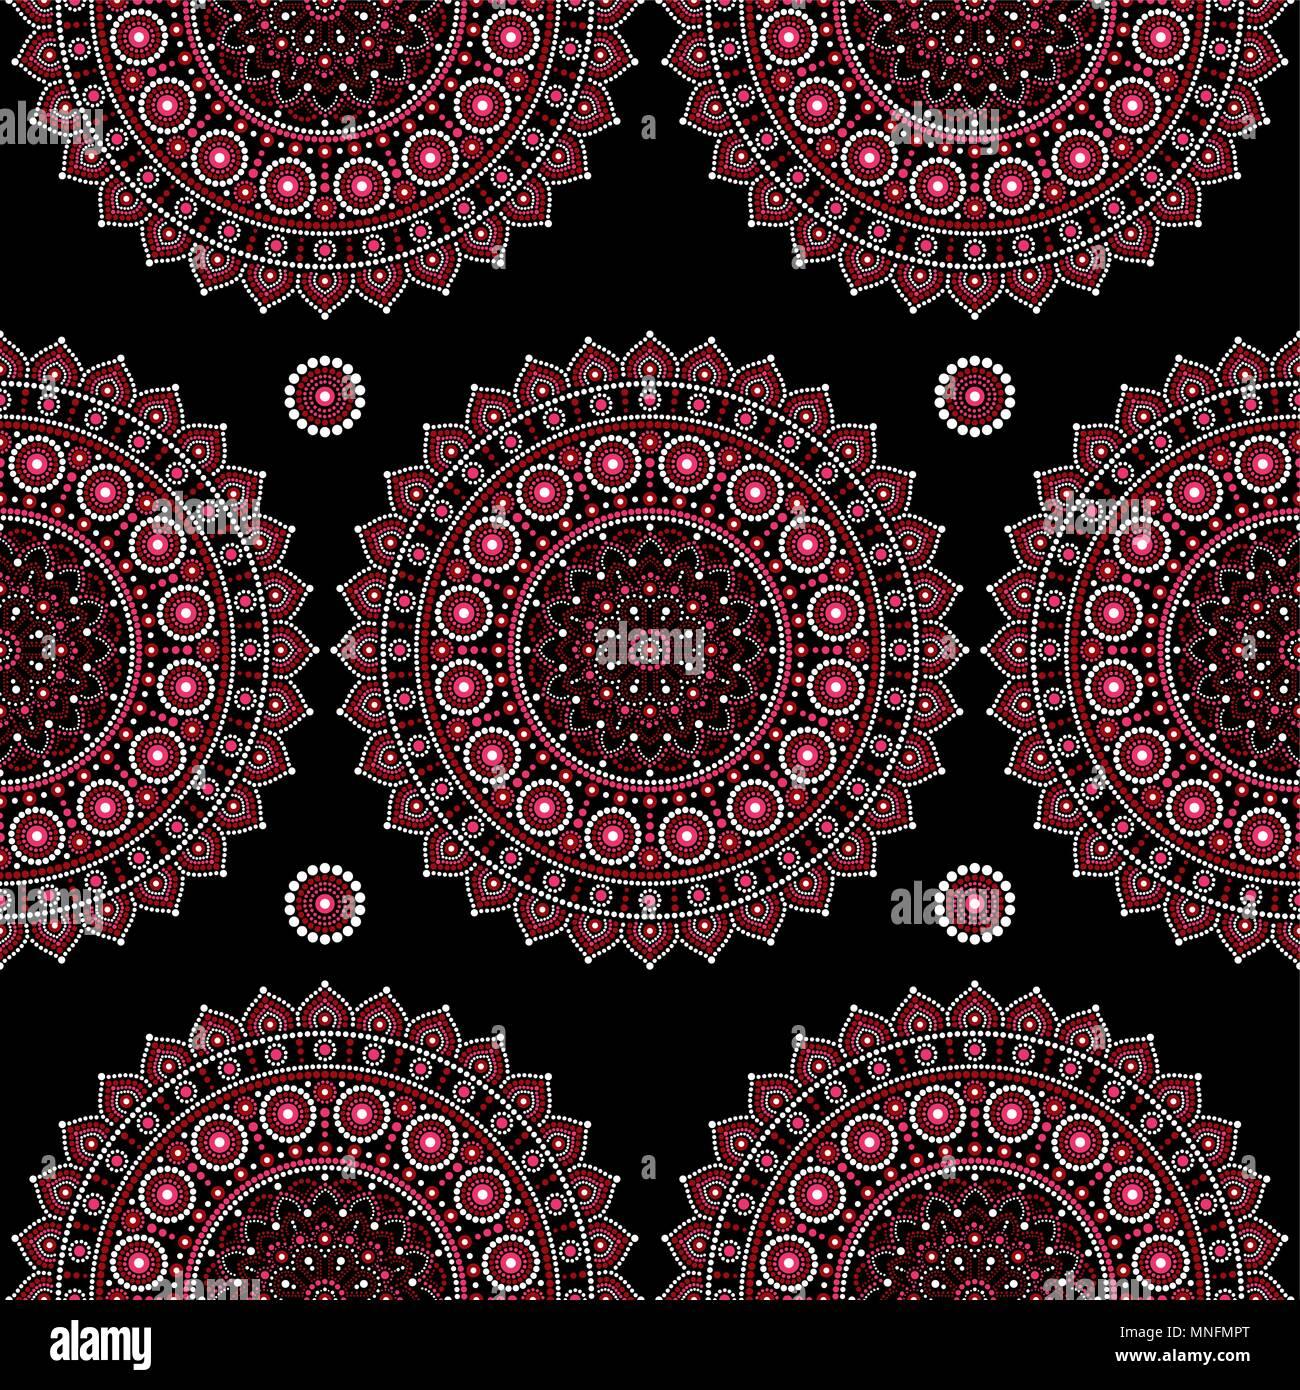 Mandala Vector Seamless Pattern Aboriginal Dot Painting Design Australian Folk Art Boho Style Repetitive Background Mandalas Decoration In Pink